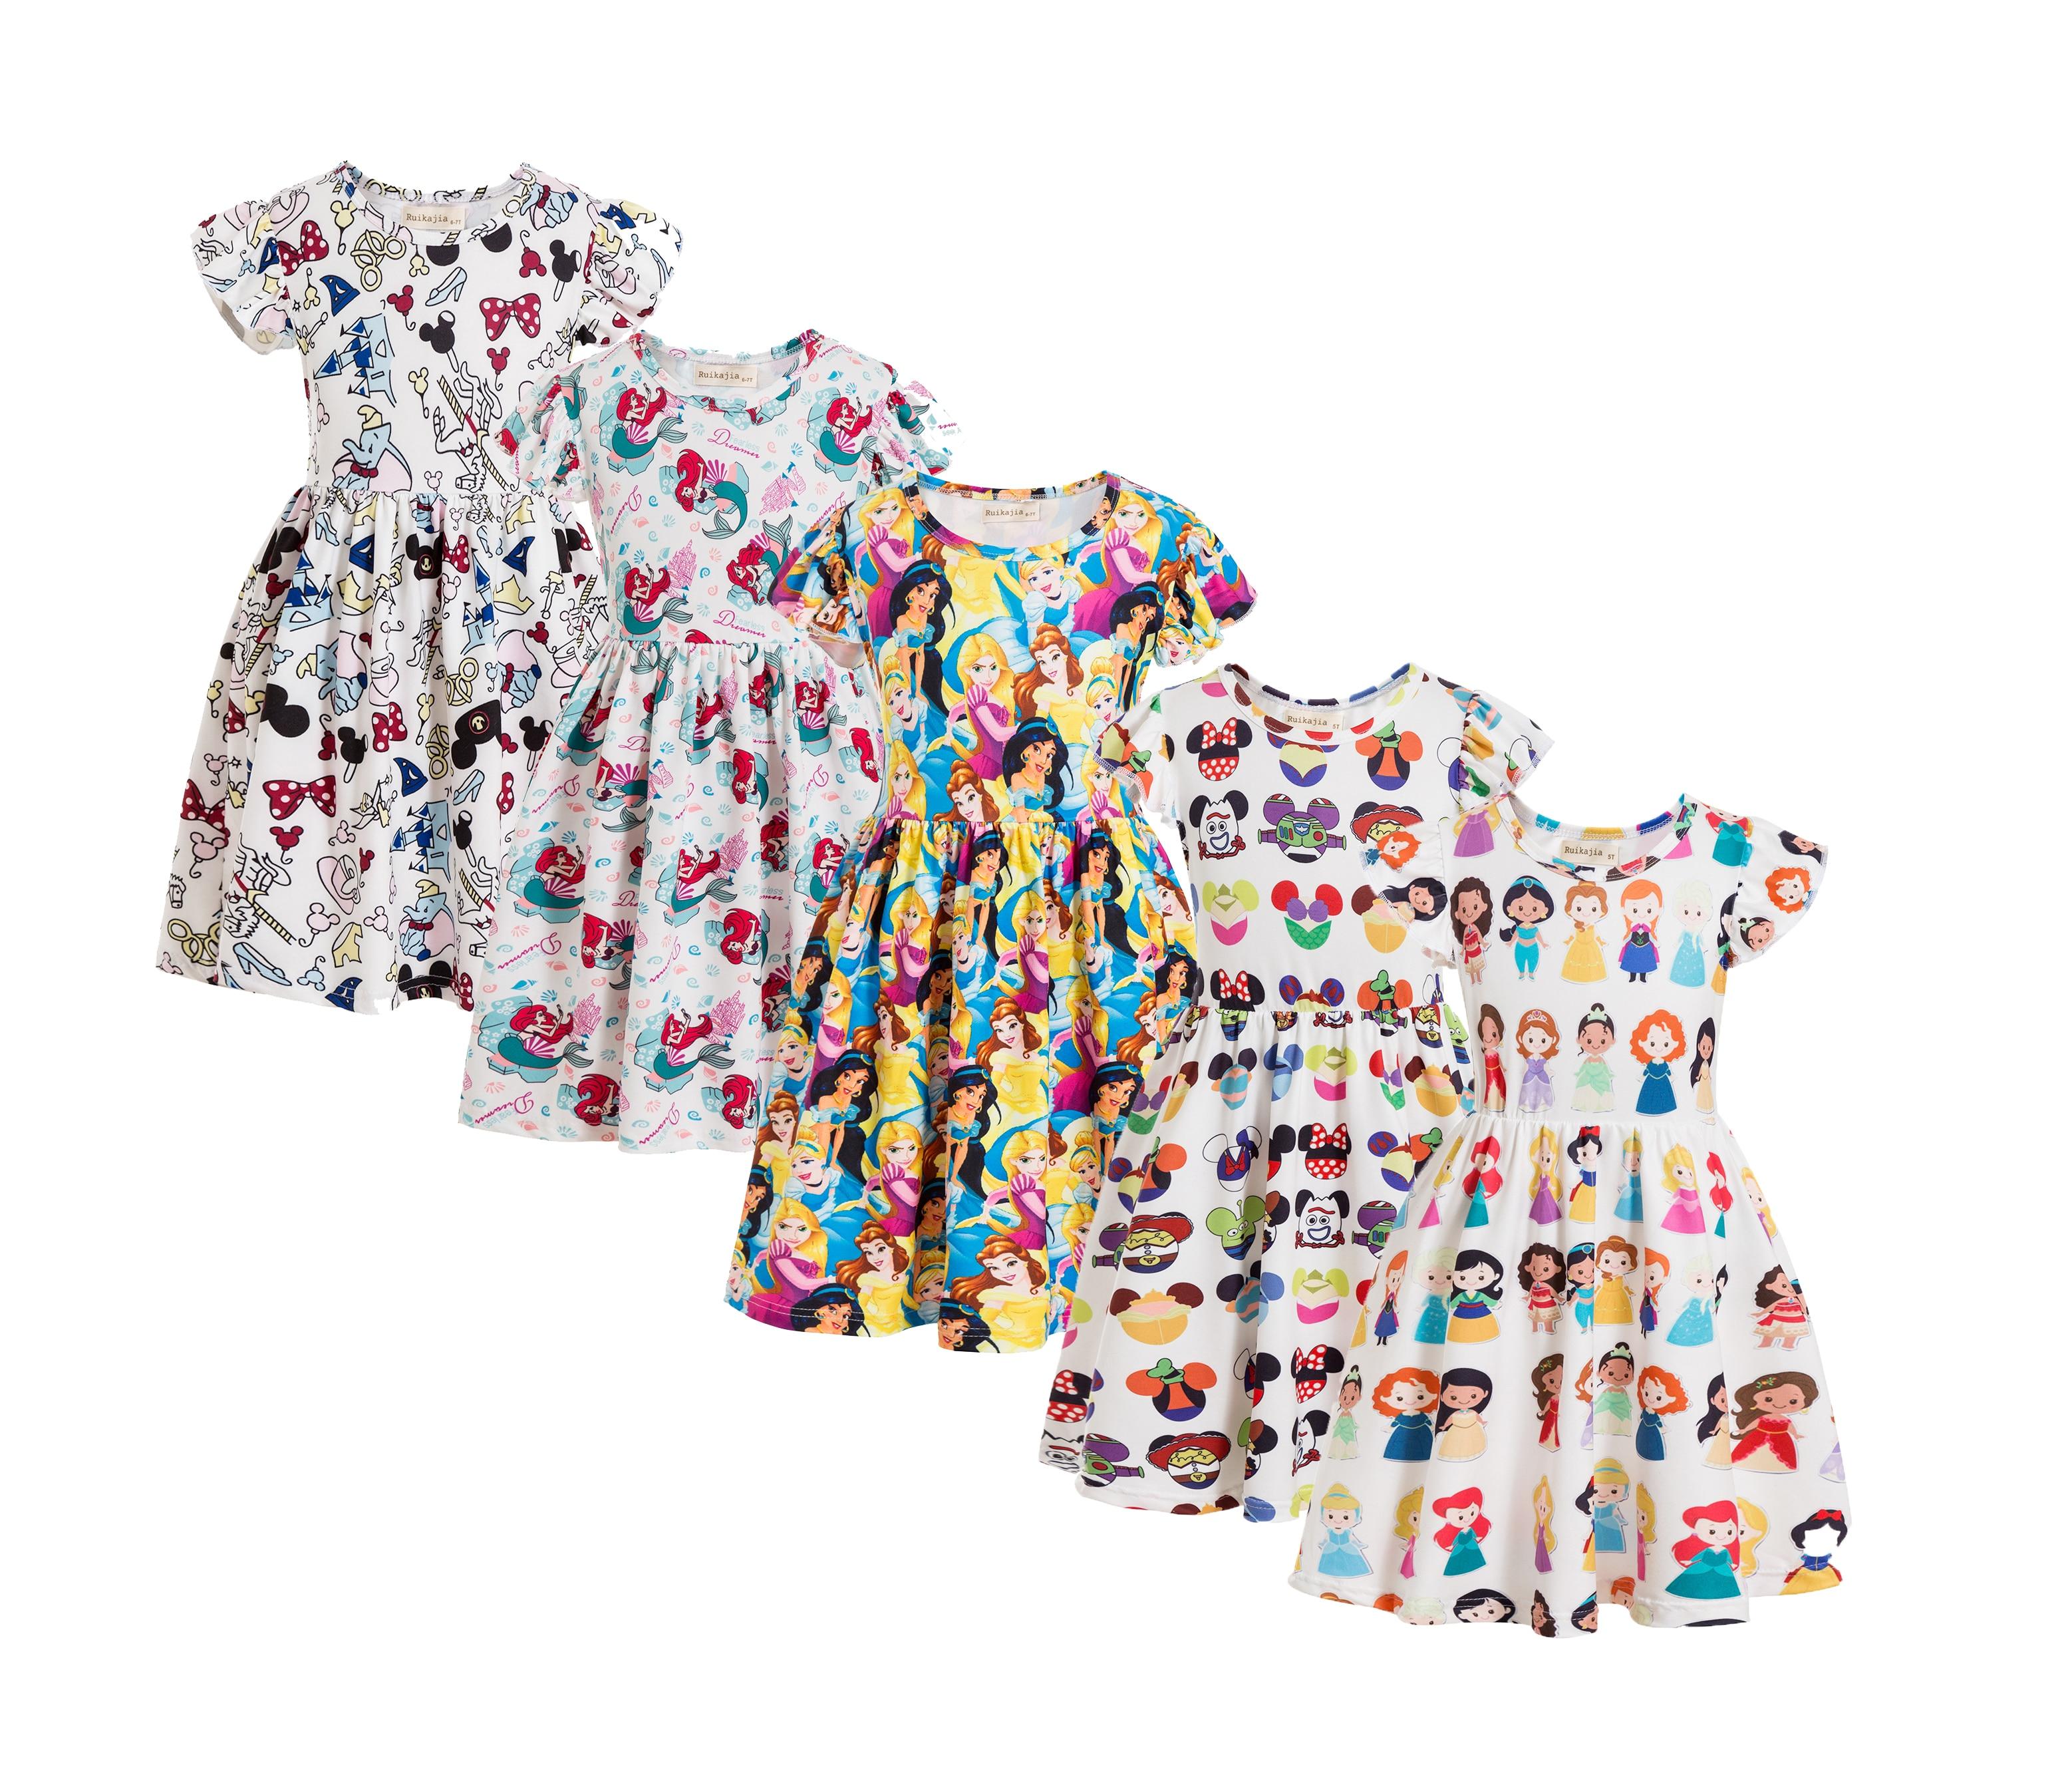 Baby Girls Dresses Summer Clothes Cute Cartoon Princess Mickey Head Printed Minnie Sofia Snow White Princess Dress Mouse Head